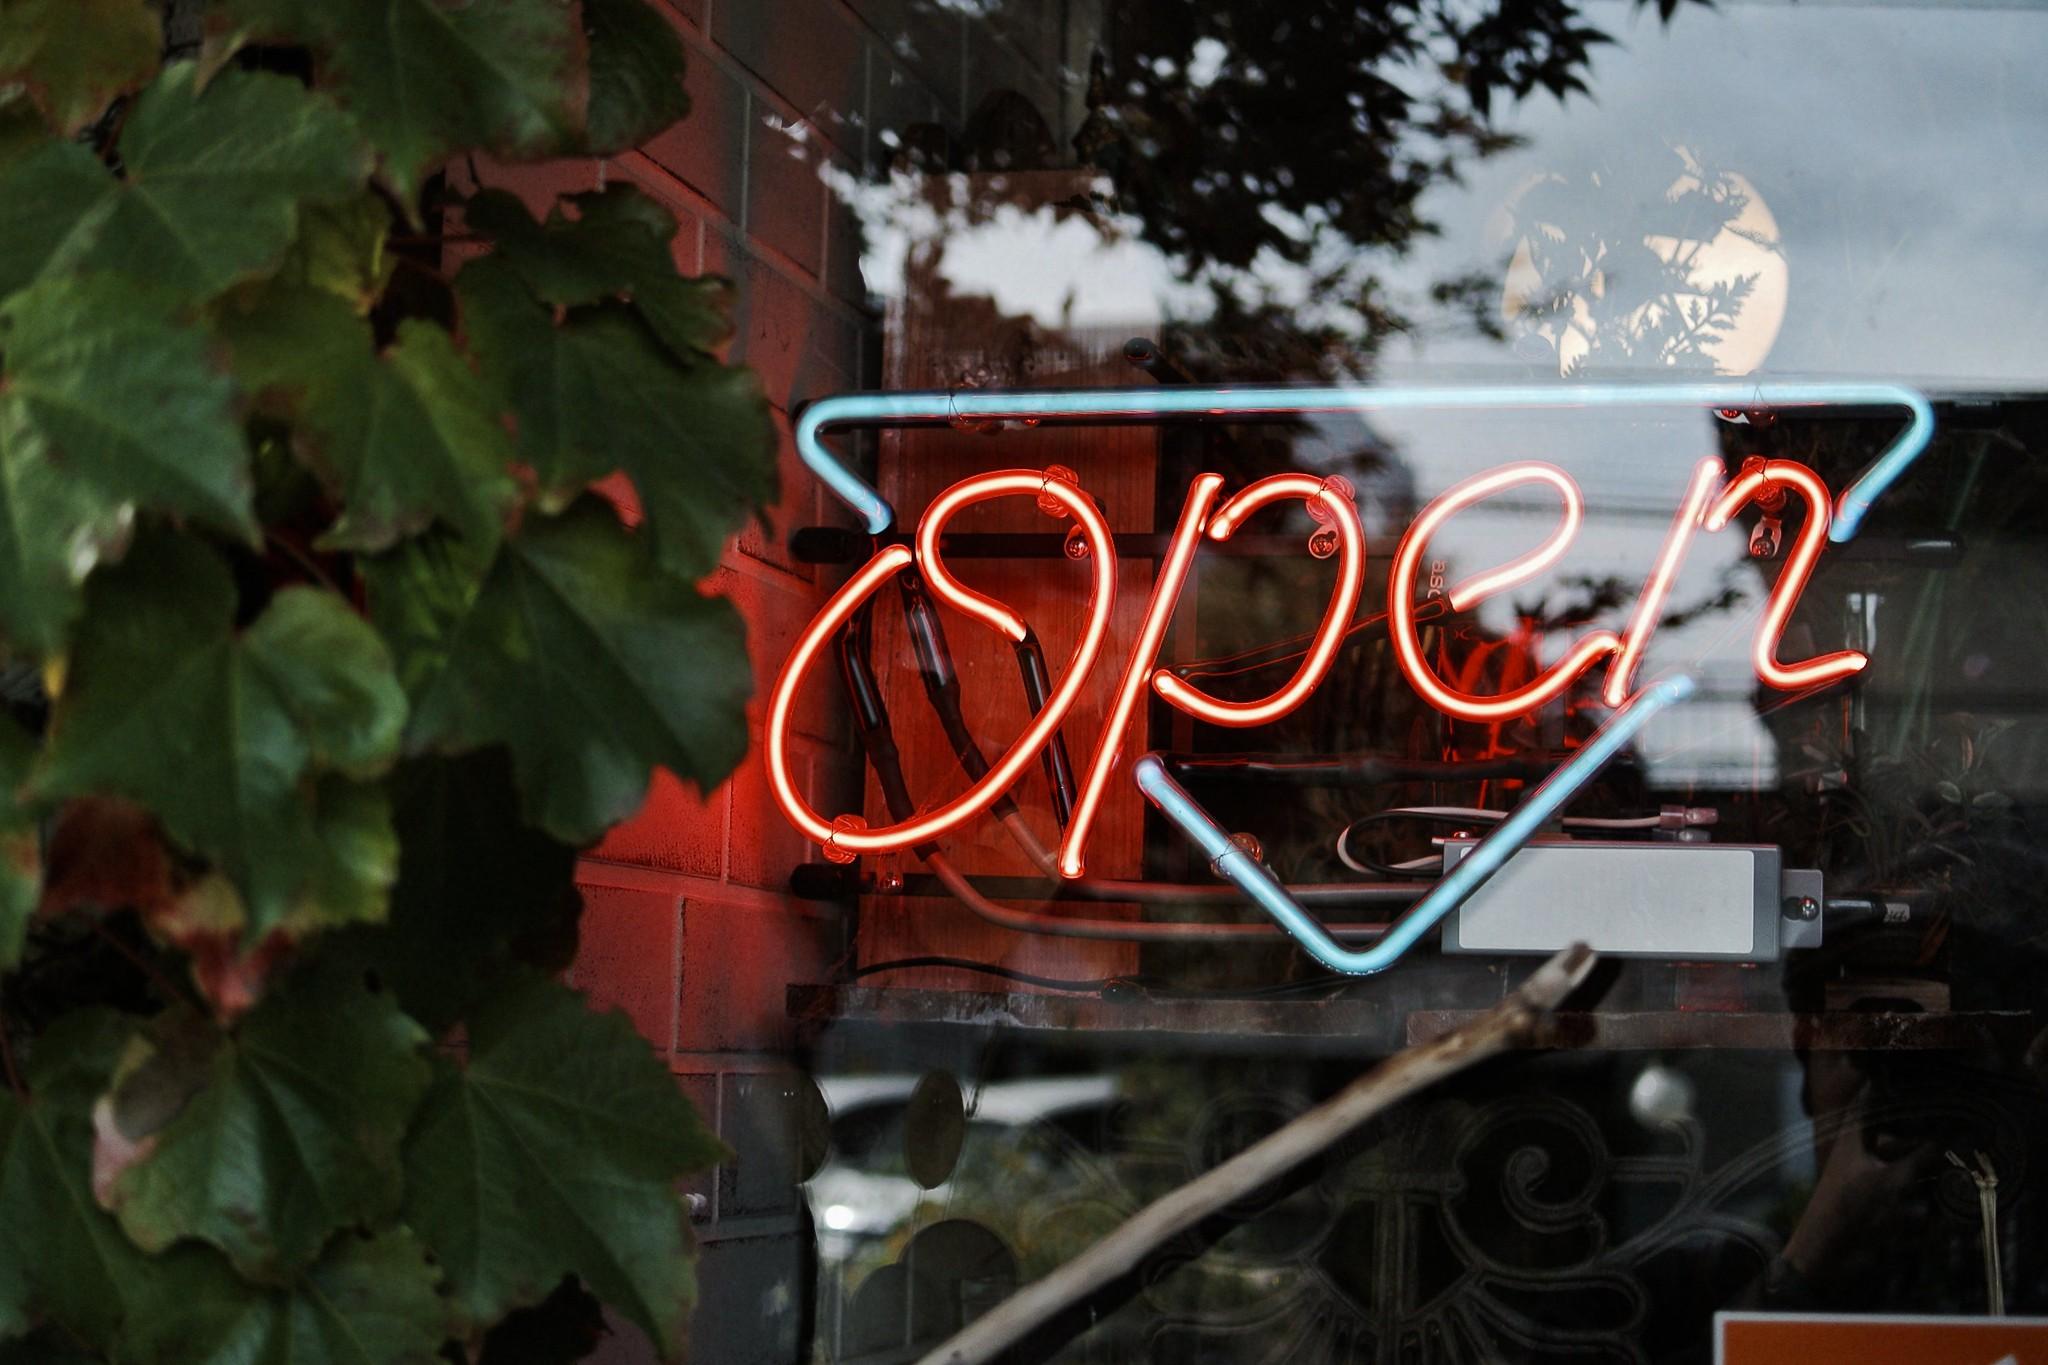 open – Miki Yoshihito via Flickr CCBY20